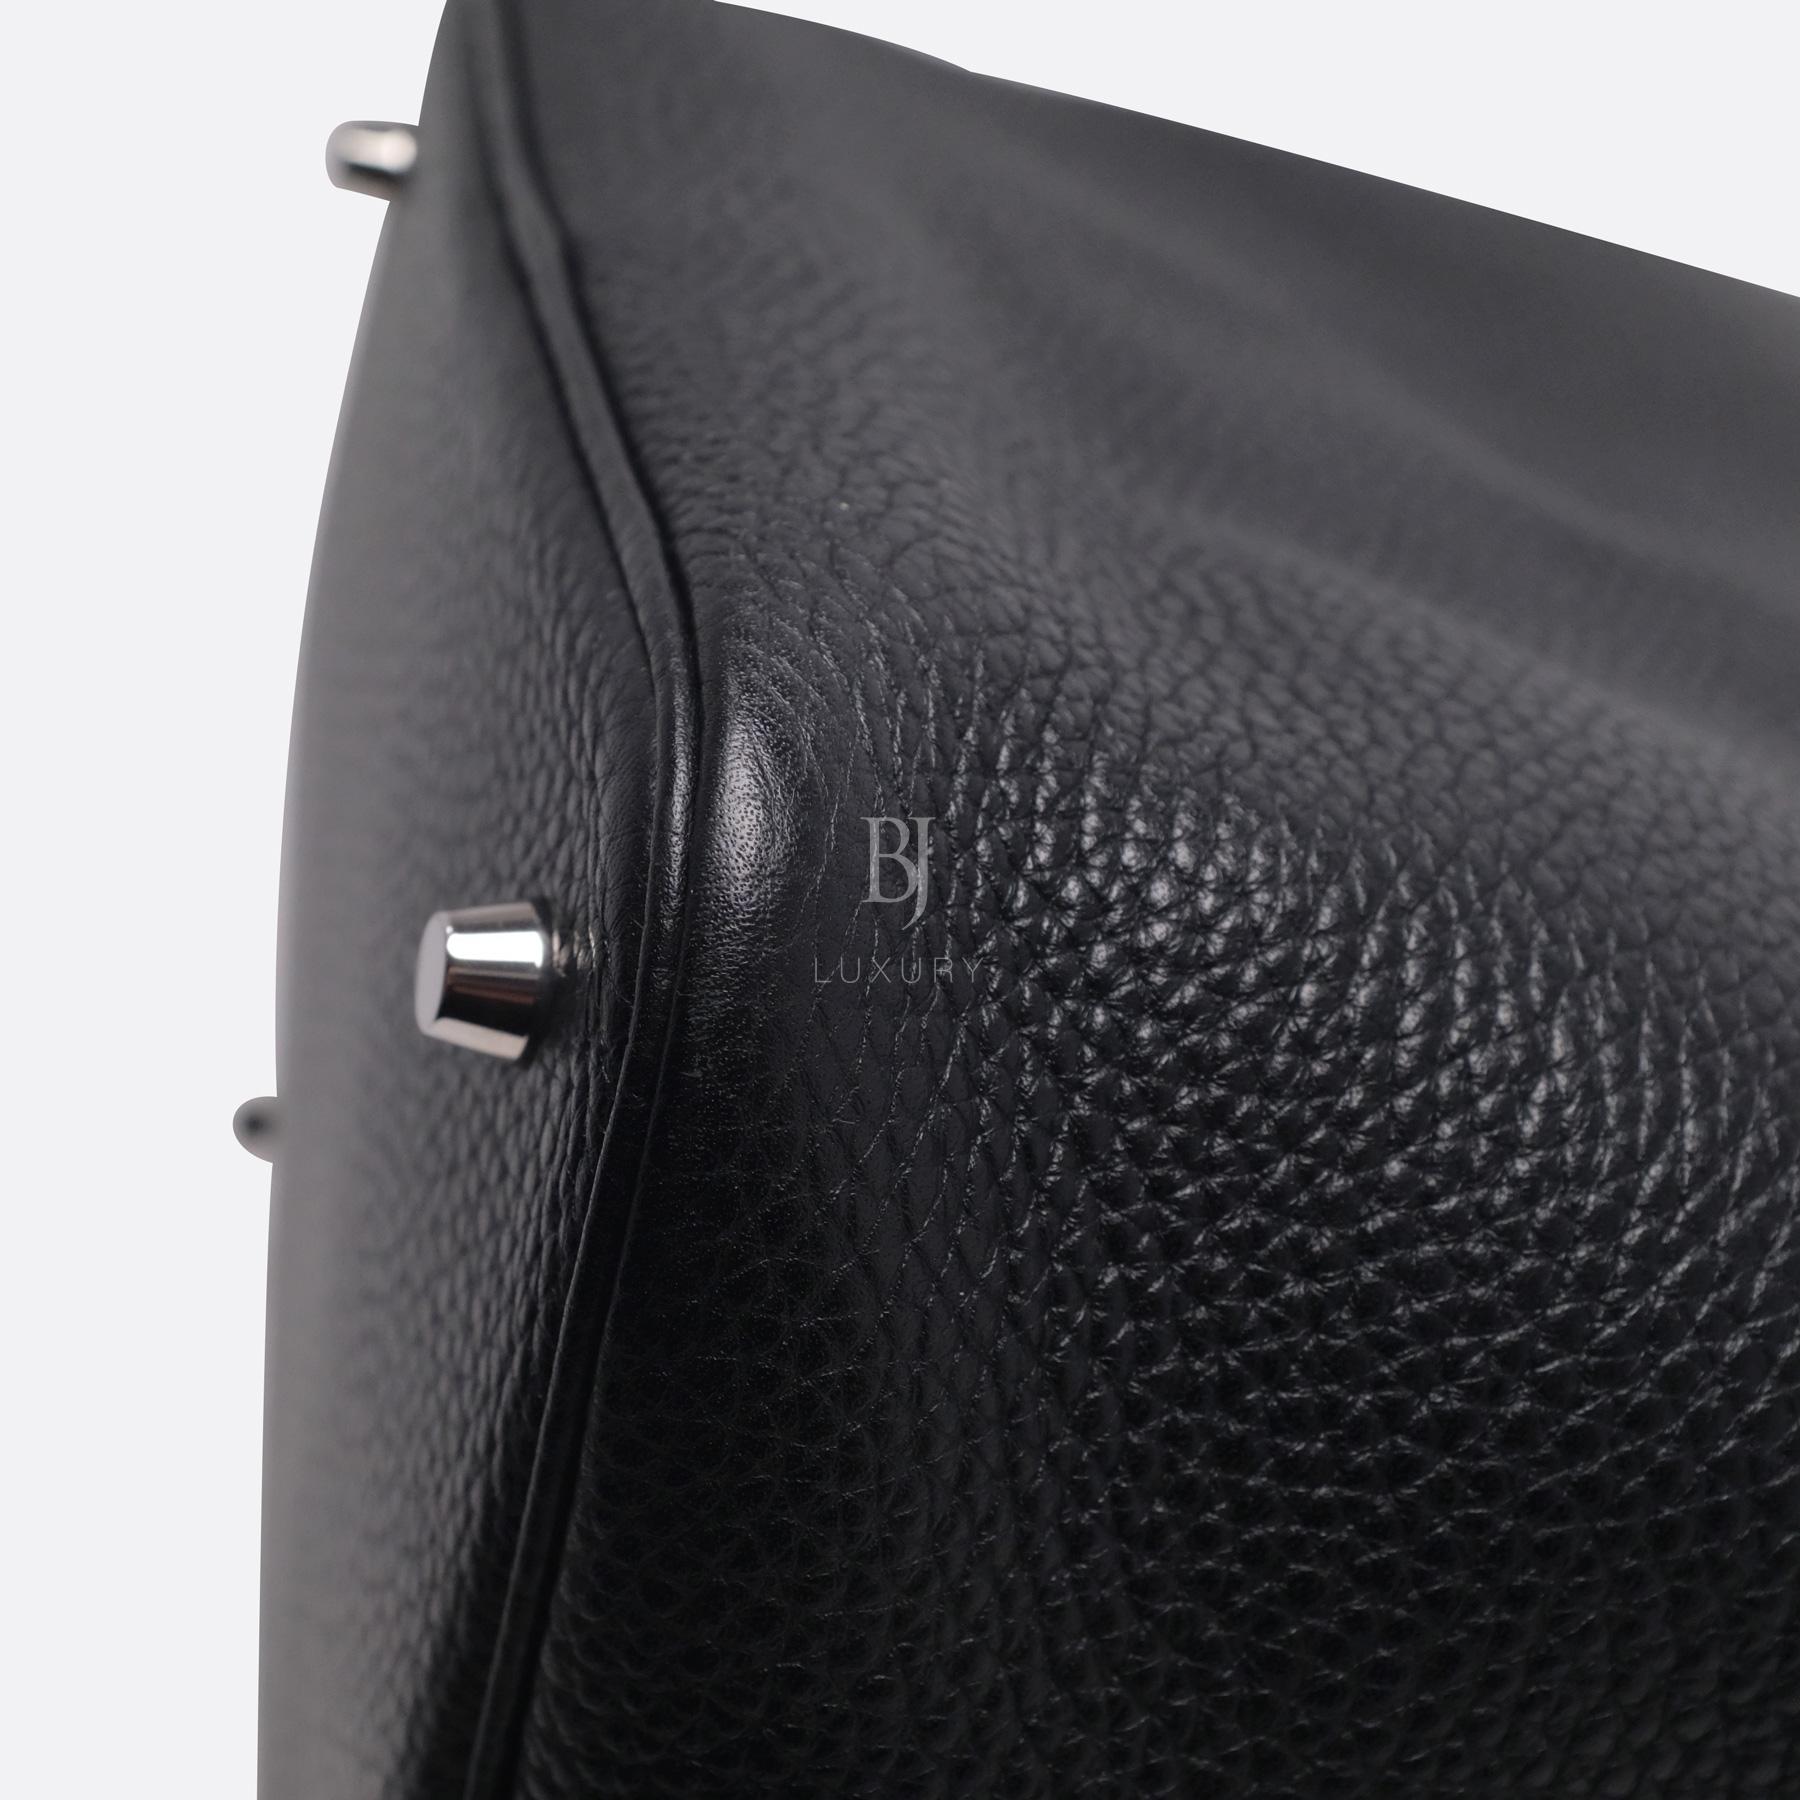 Hermes Picotin 22 Palladium Clemence BJ Luxury 11.jpg